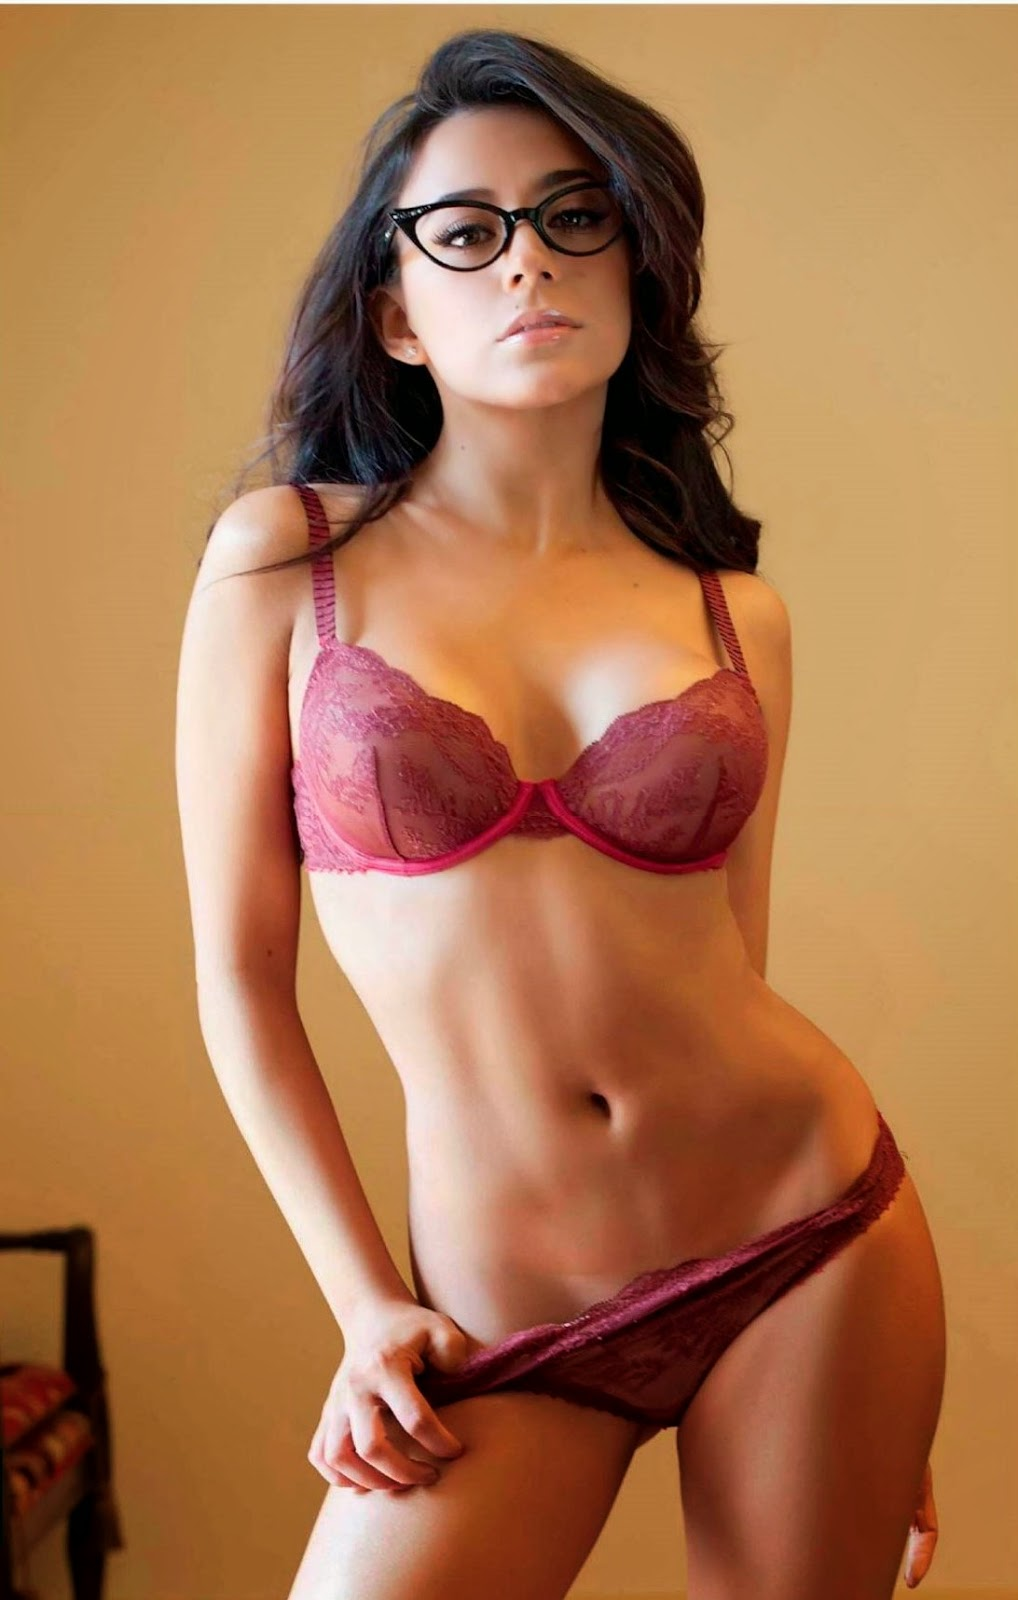 ... Digital: Jass Reyes posó en la revista H para hombres, octubre 2014